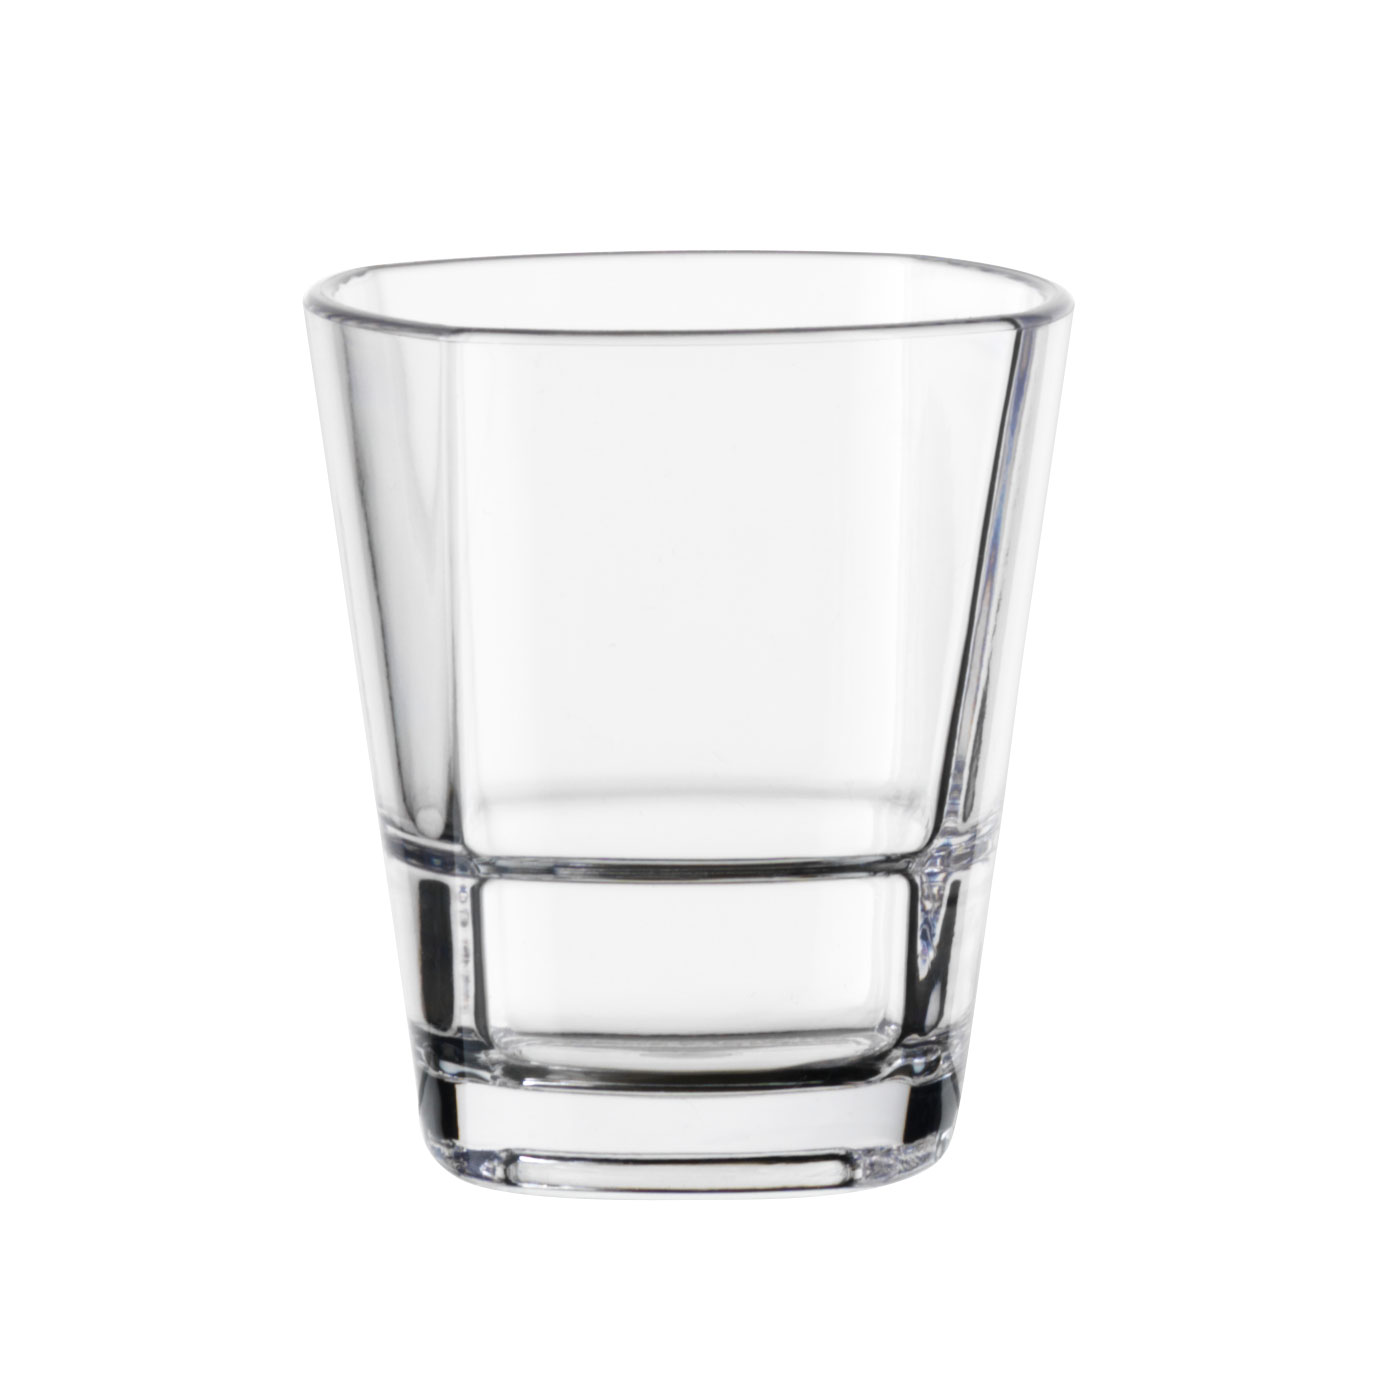 Libbey Glass 92440 glassware, plastic